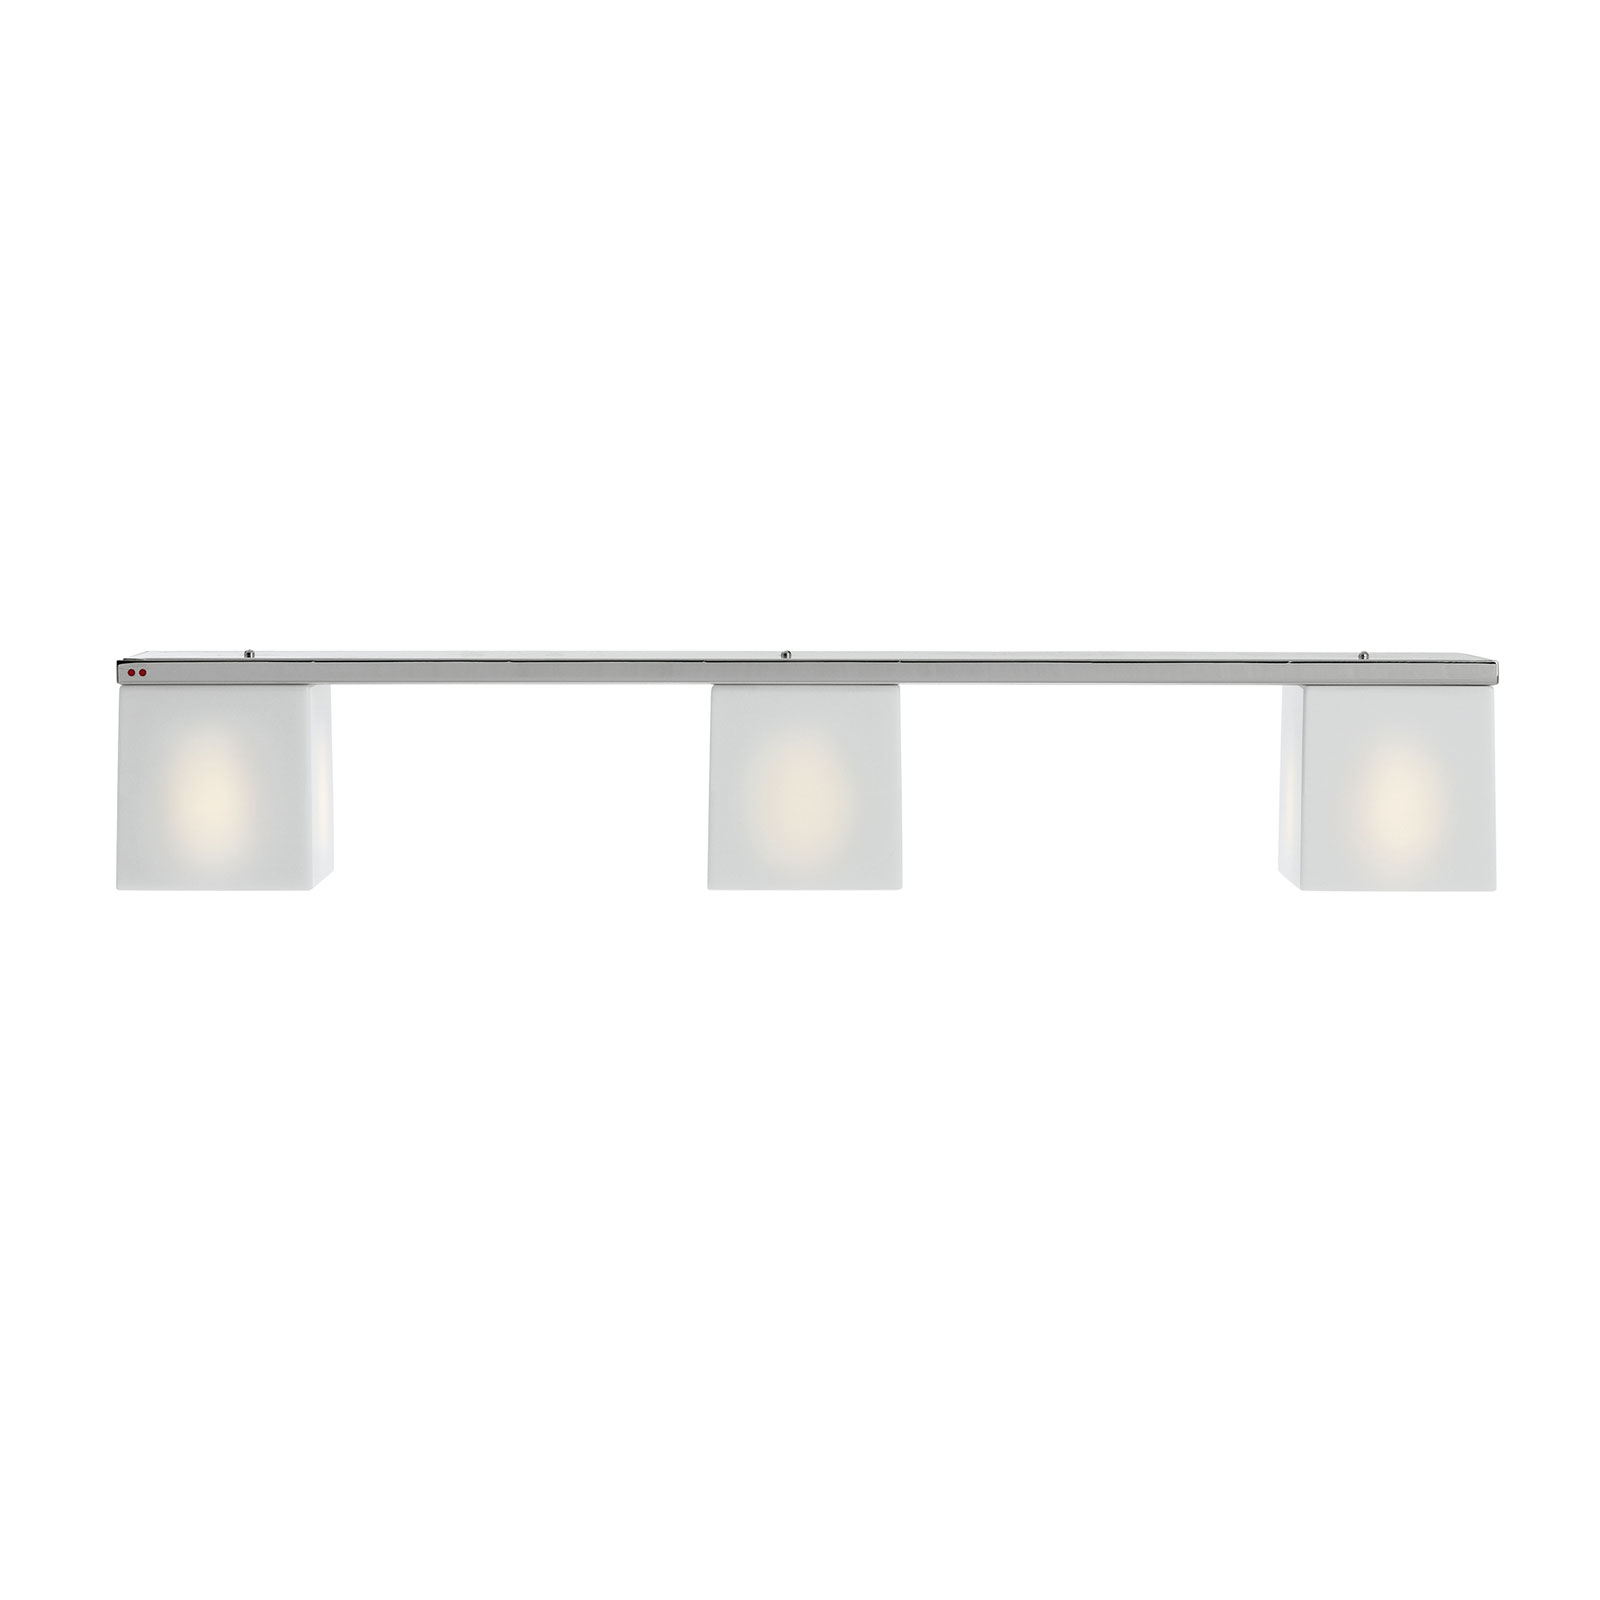 Fabbian Cubetto Deckenlampe 3-flammig GU10 weiß